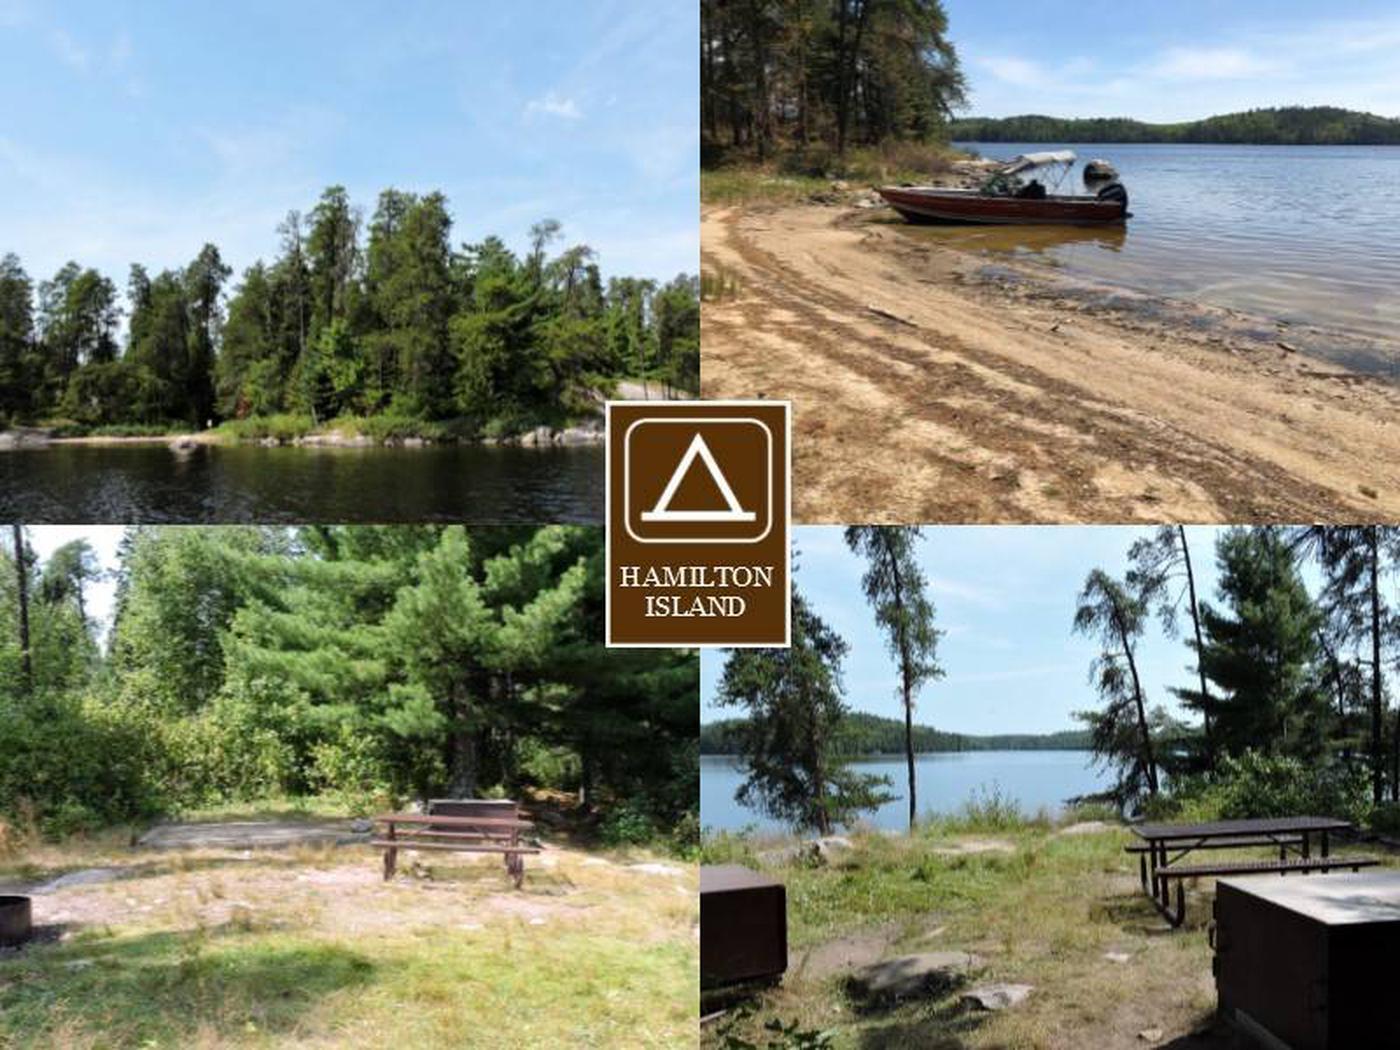 N11 - Hamilton Island EastN11 - Hamilton Island East campsite on Namakan Lake